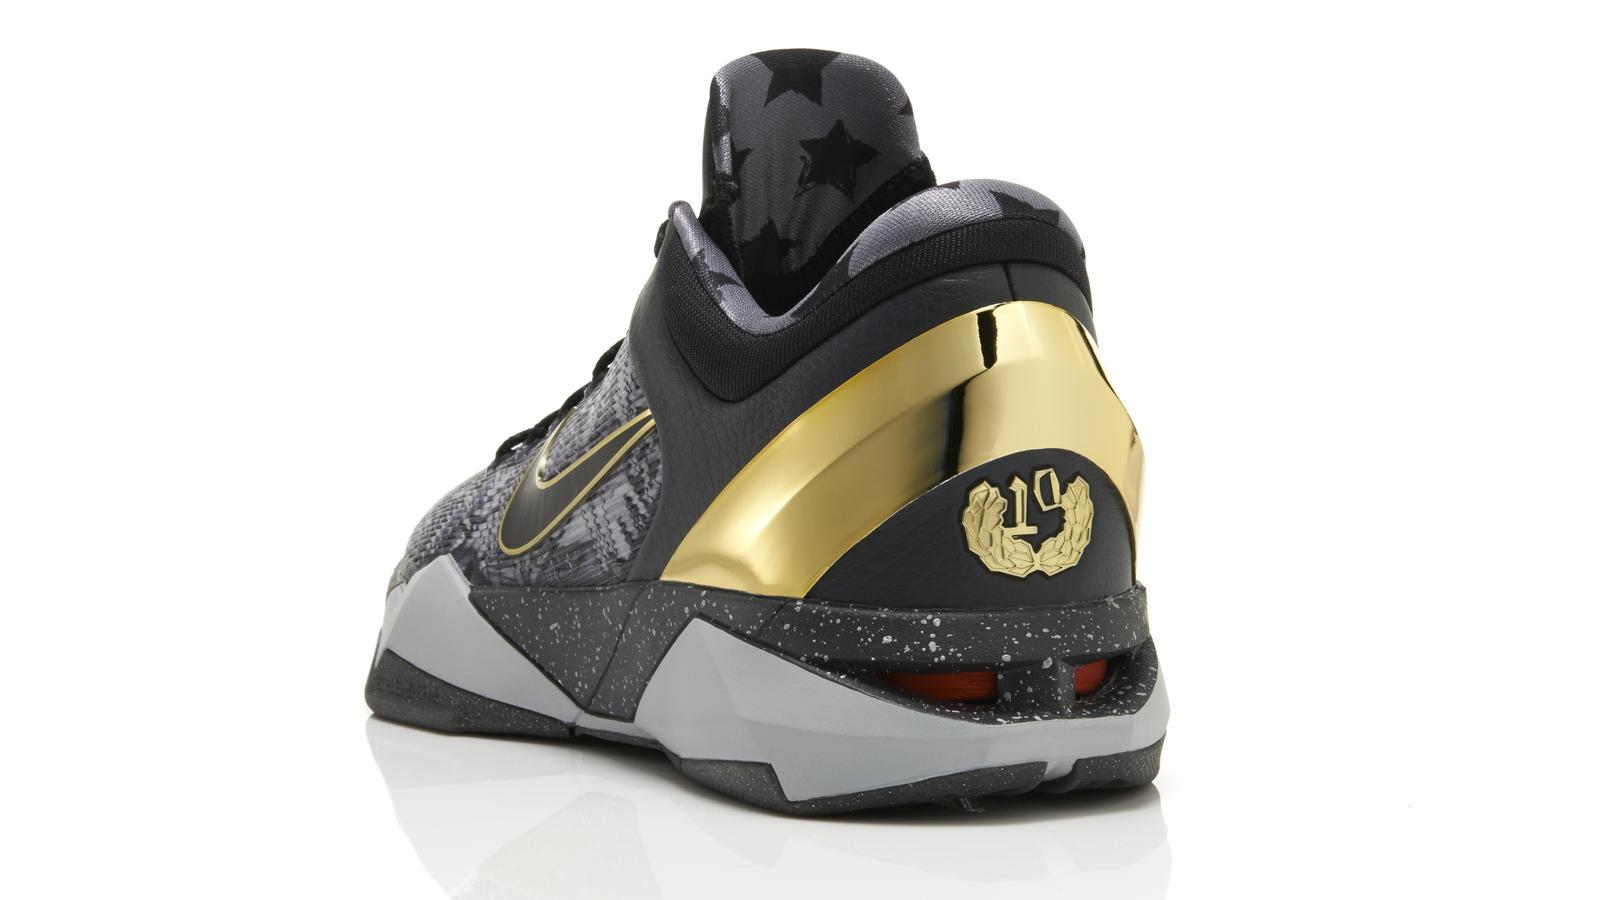 Introducing the Kobe Prelude VII - Nike